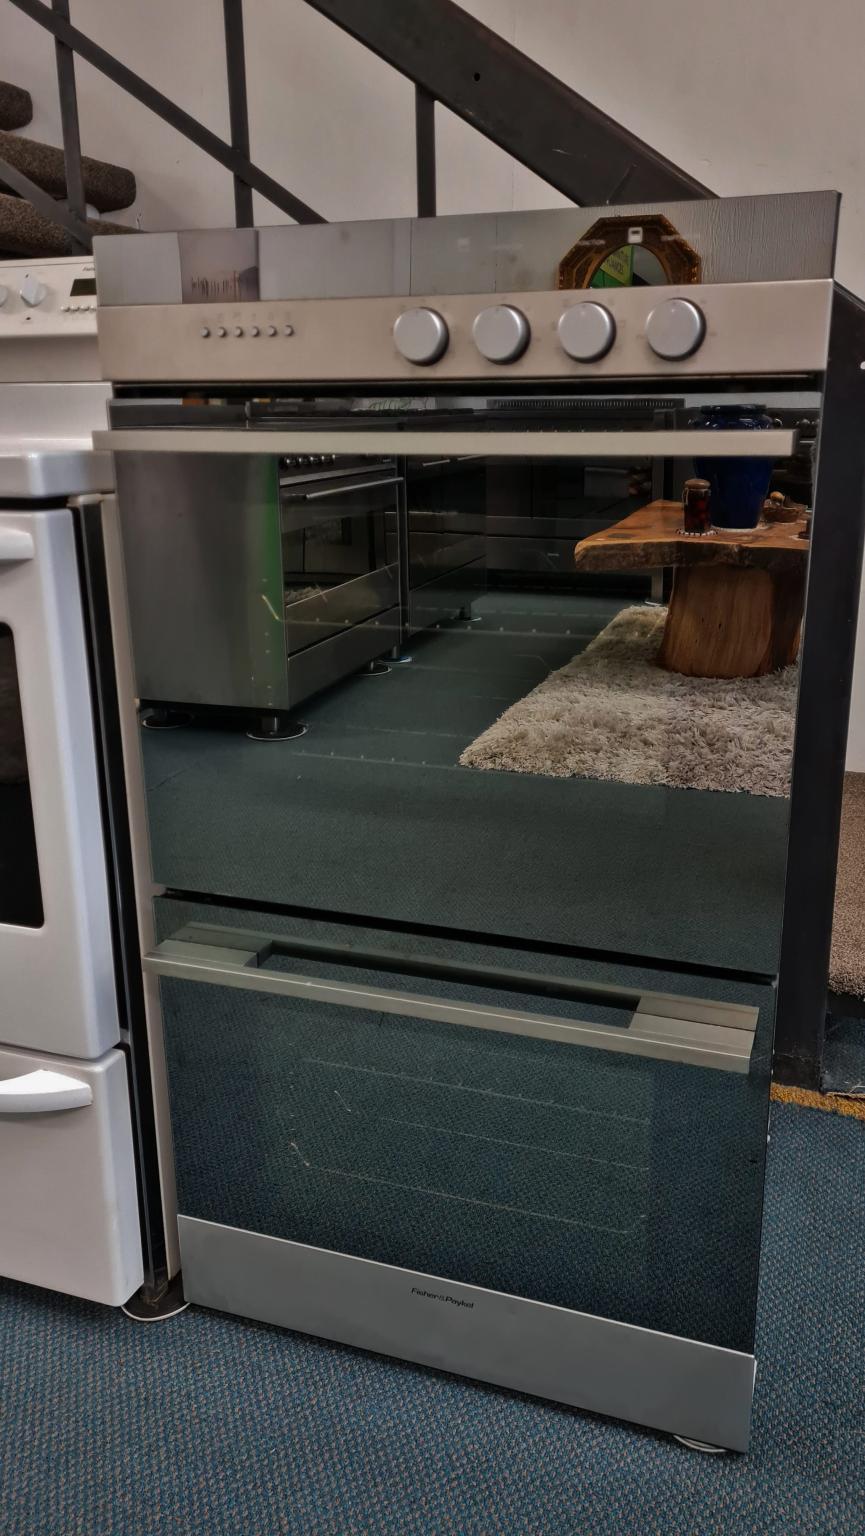 Fisher & Paykel 60cm Iridium Stainless Steel Double Oven